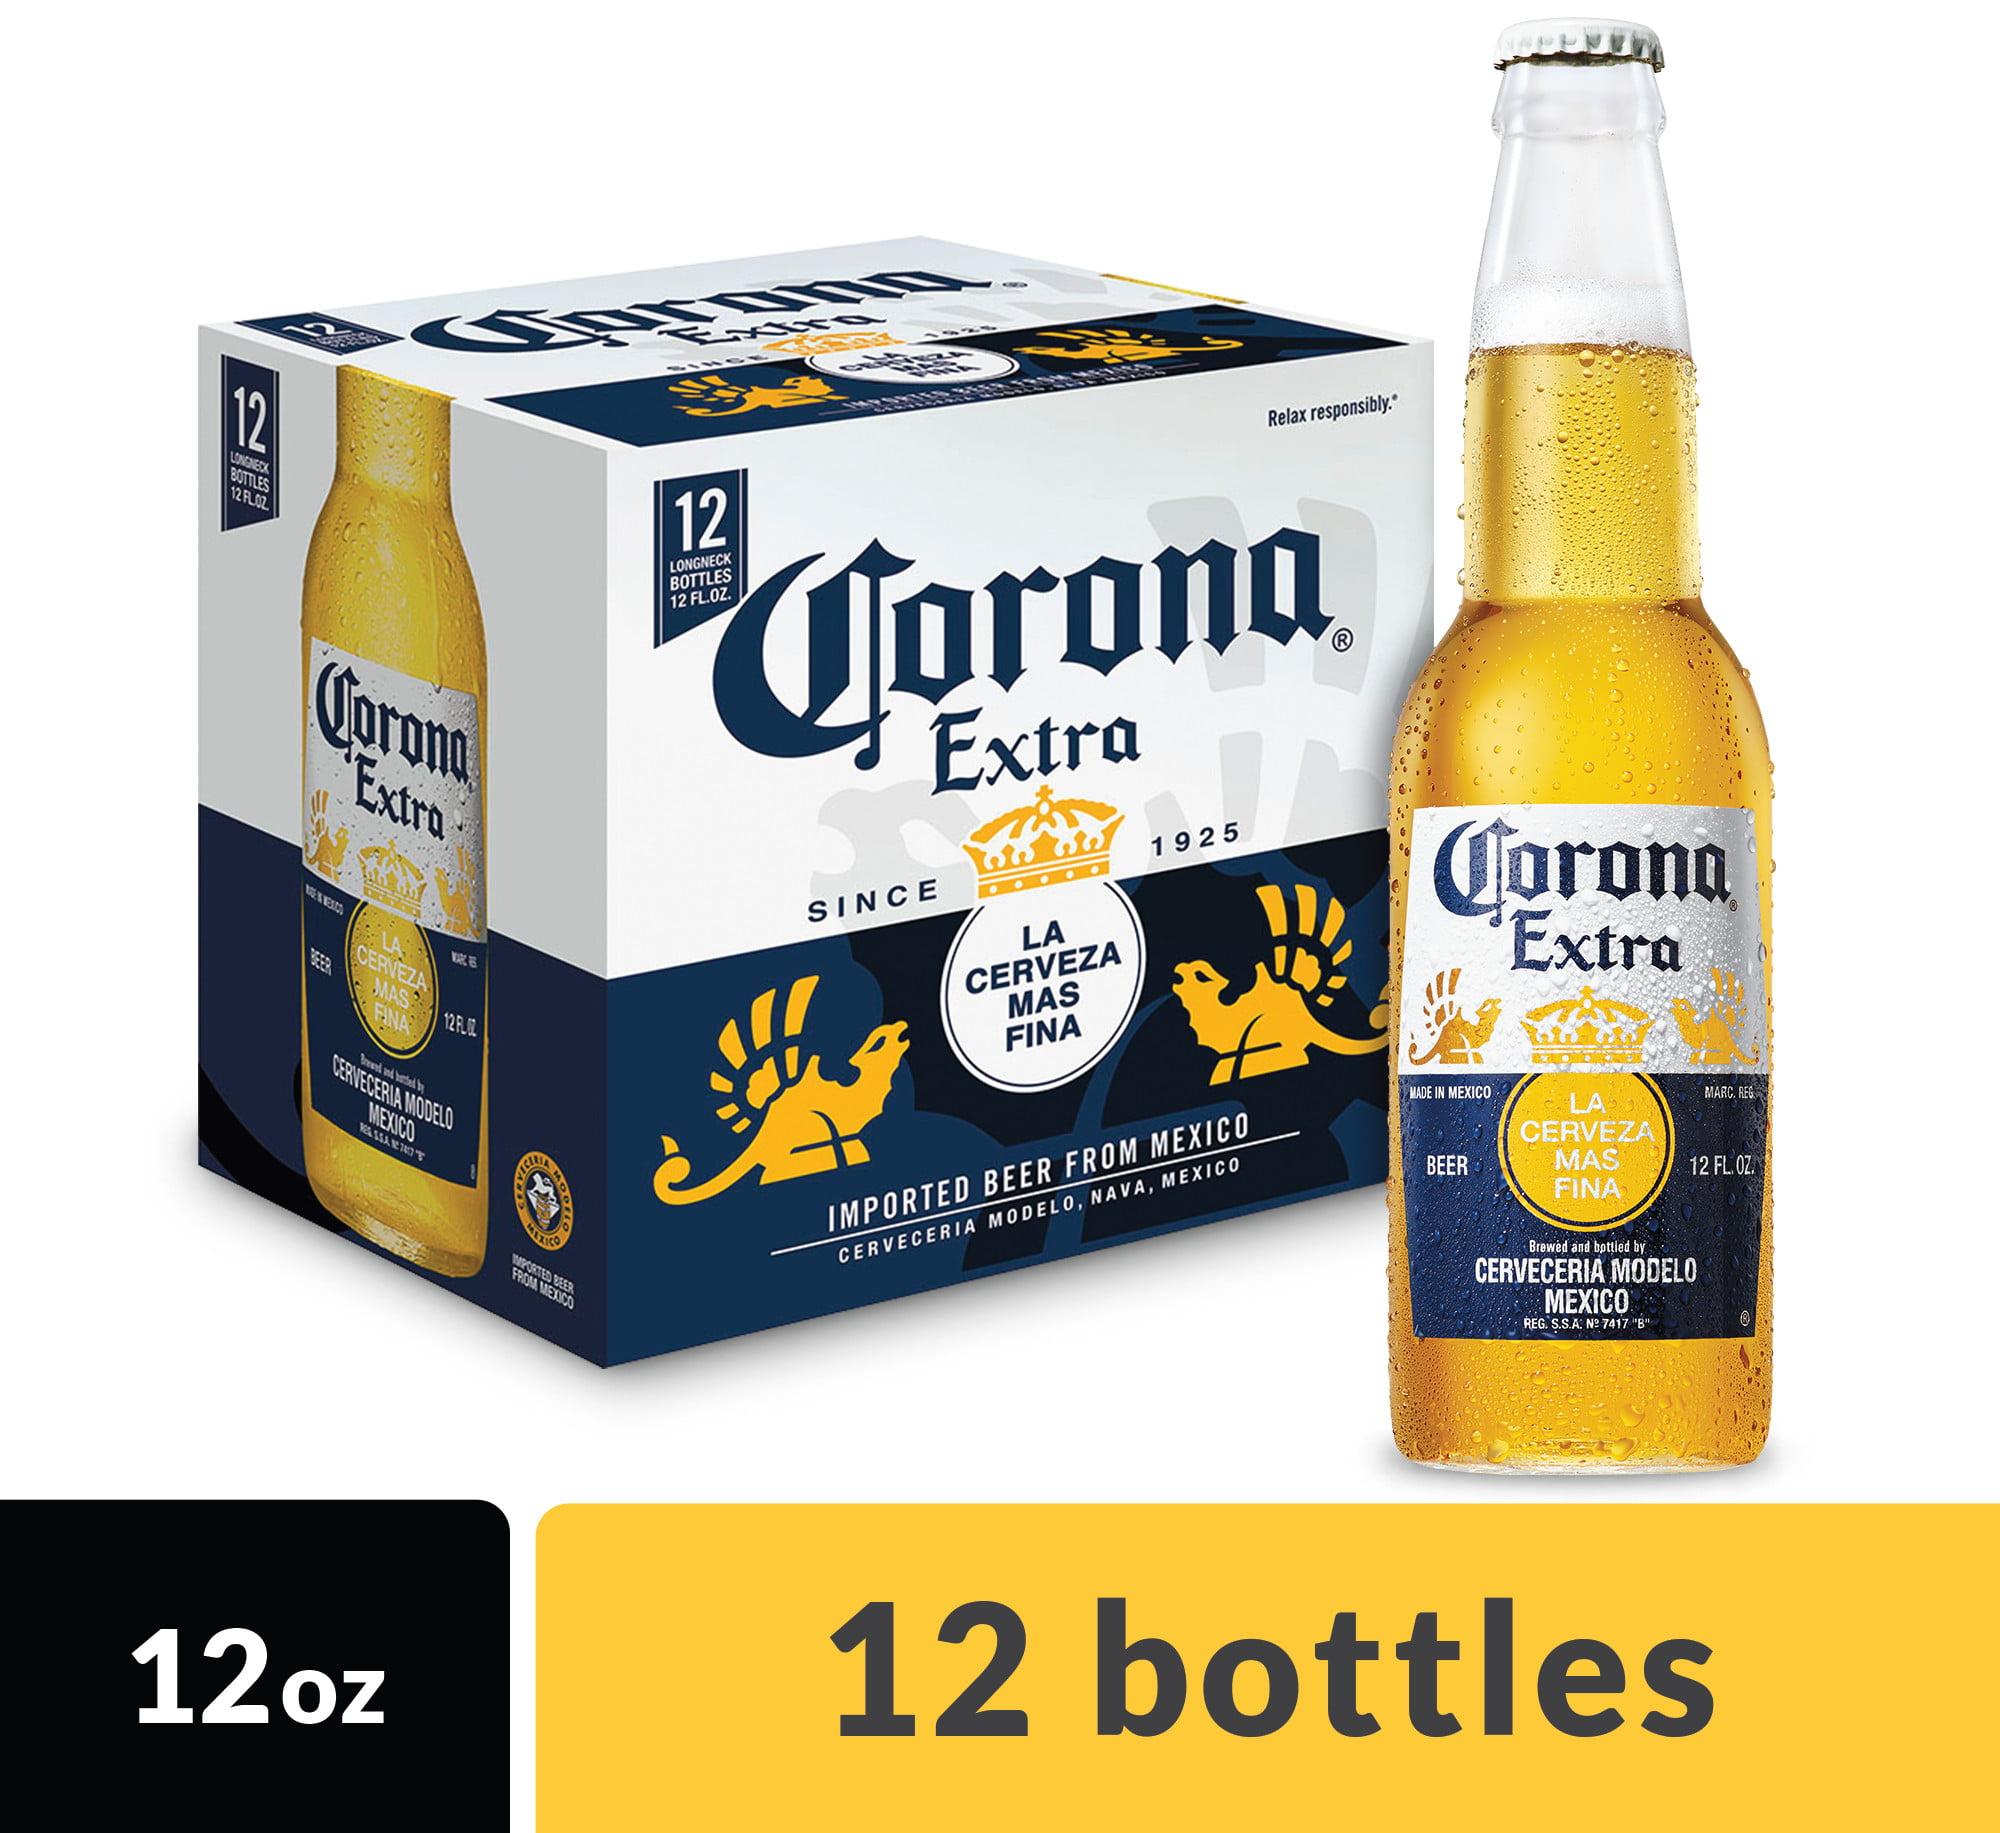 Corona Extra Mexican Import Beer, 12 pk 12 fl oz Bottles, 4.6% ABV